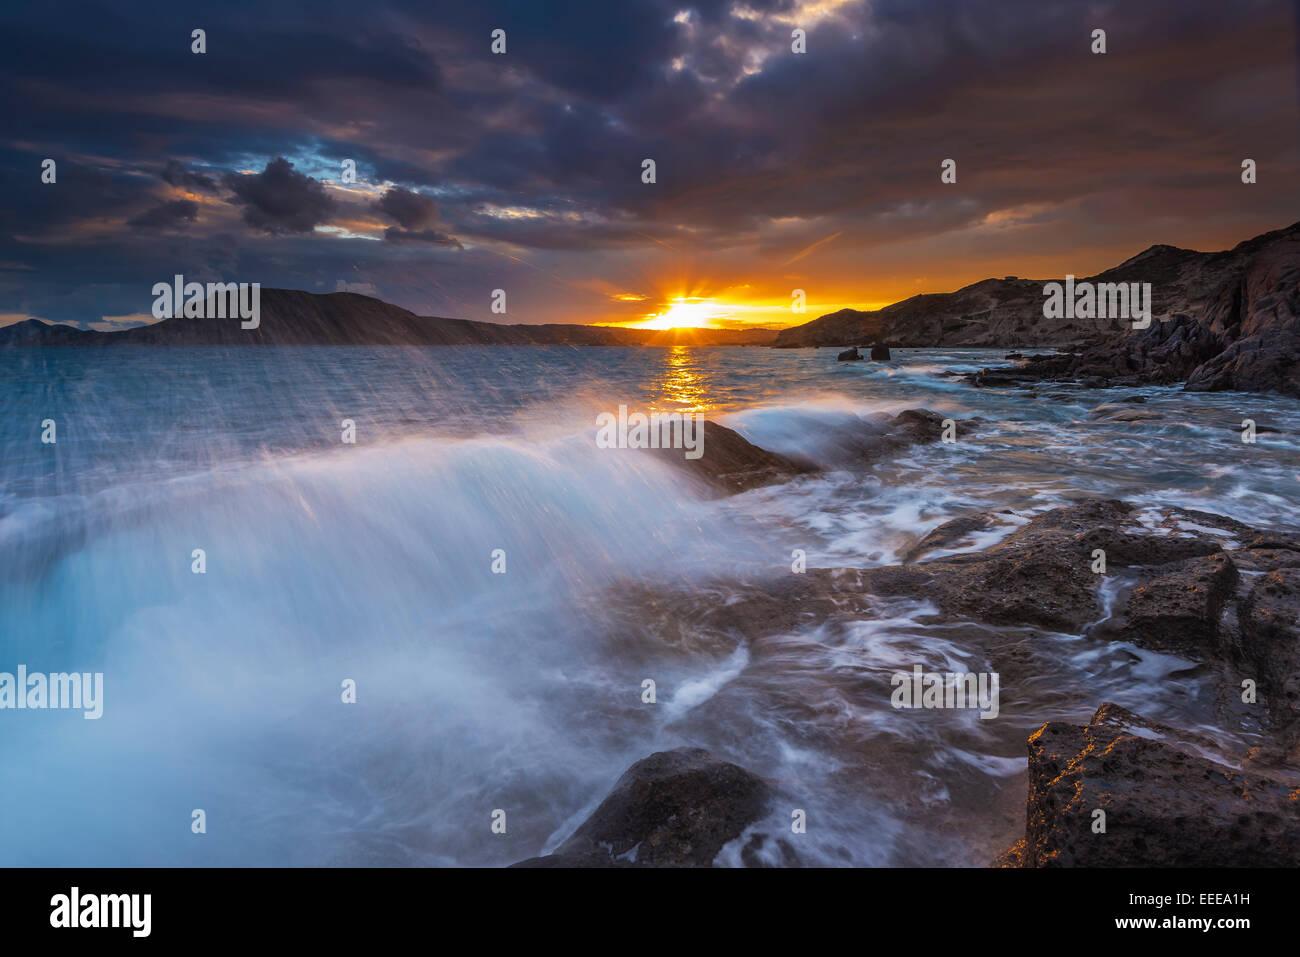 Paradise beach in Kos island at winter sunset - Stock Image